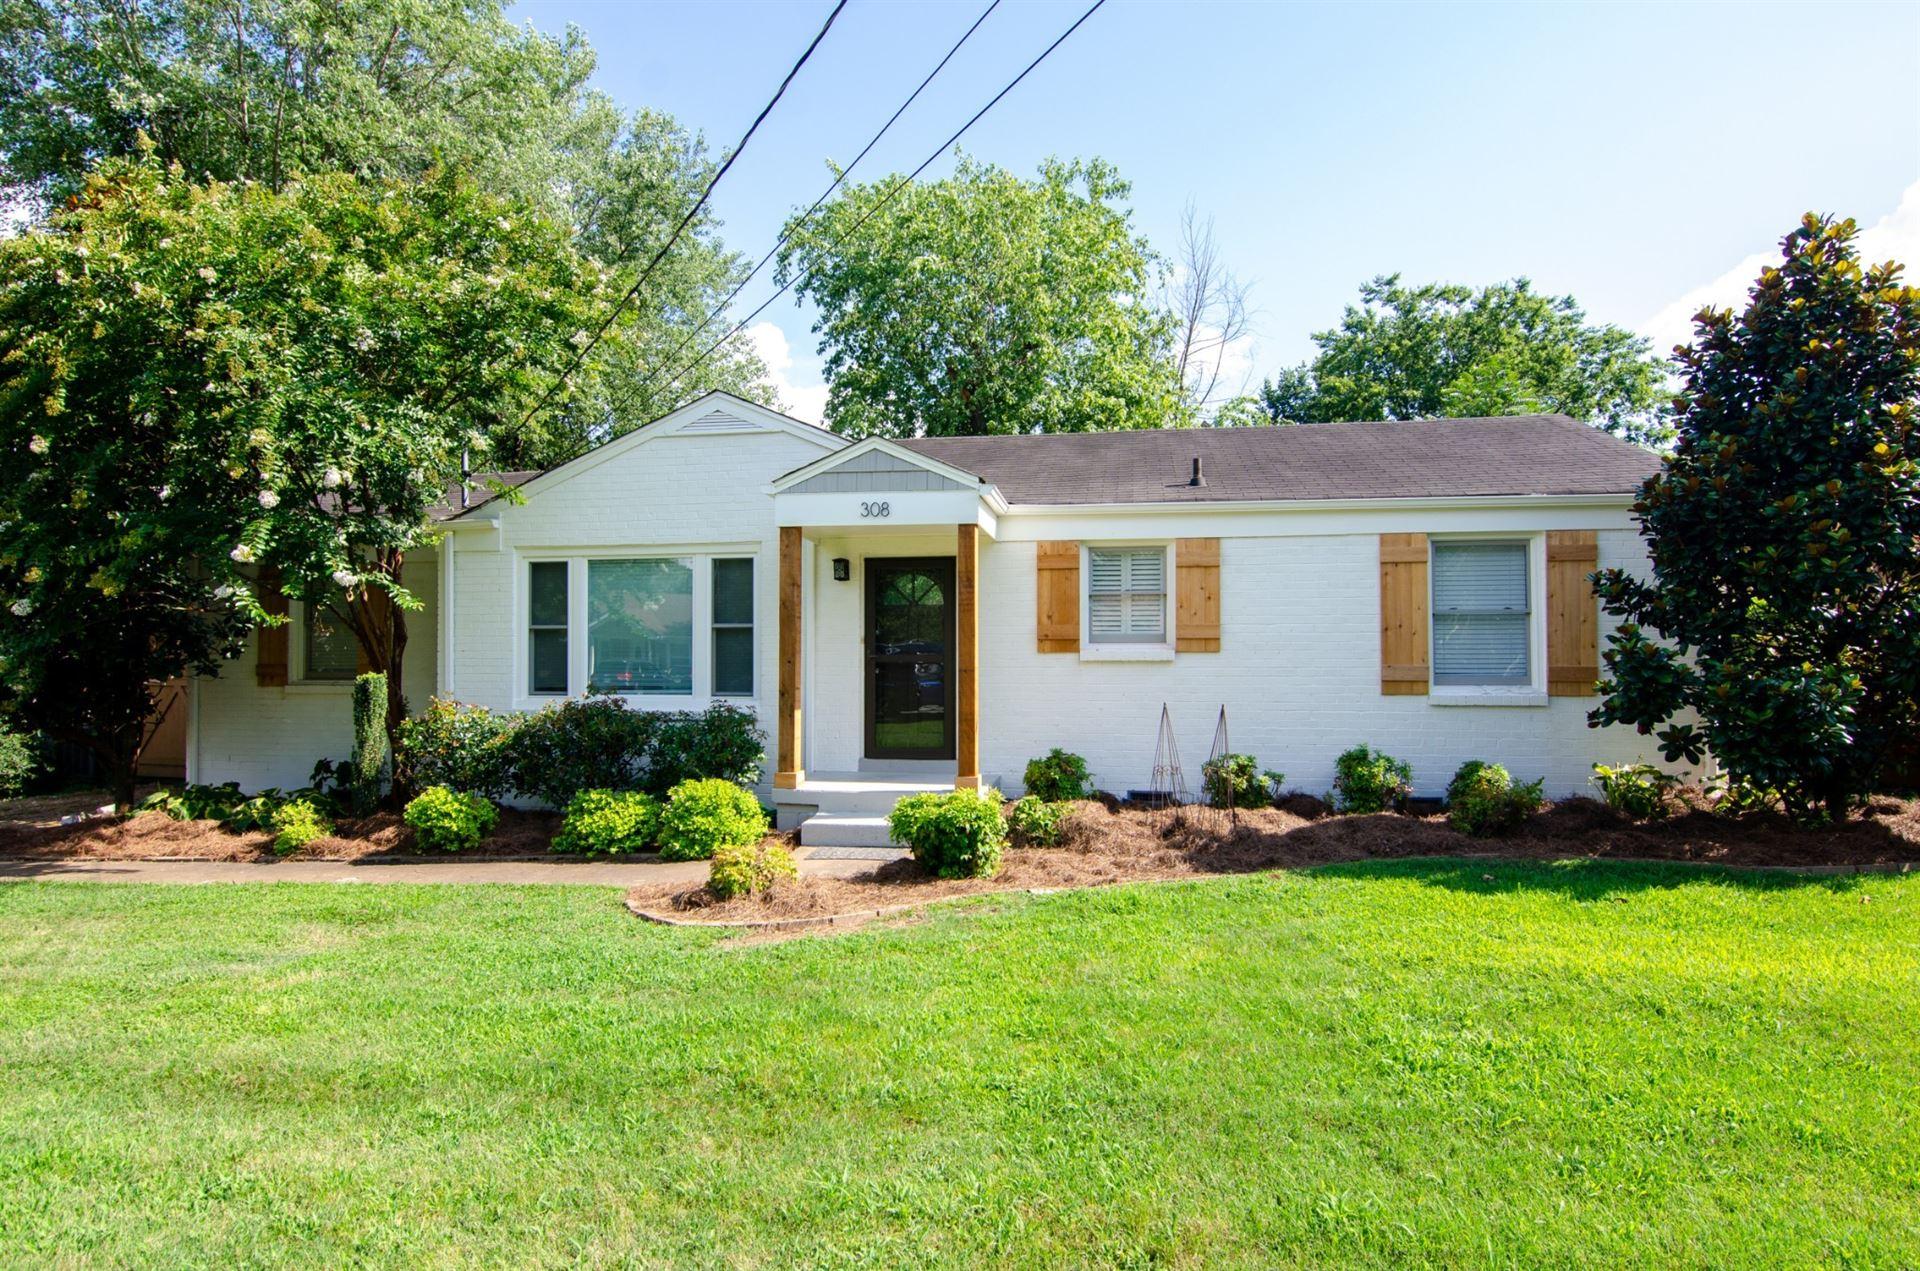 308 James Ave, Franklin, TN 37064 - MLS#: 2238974